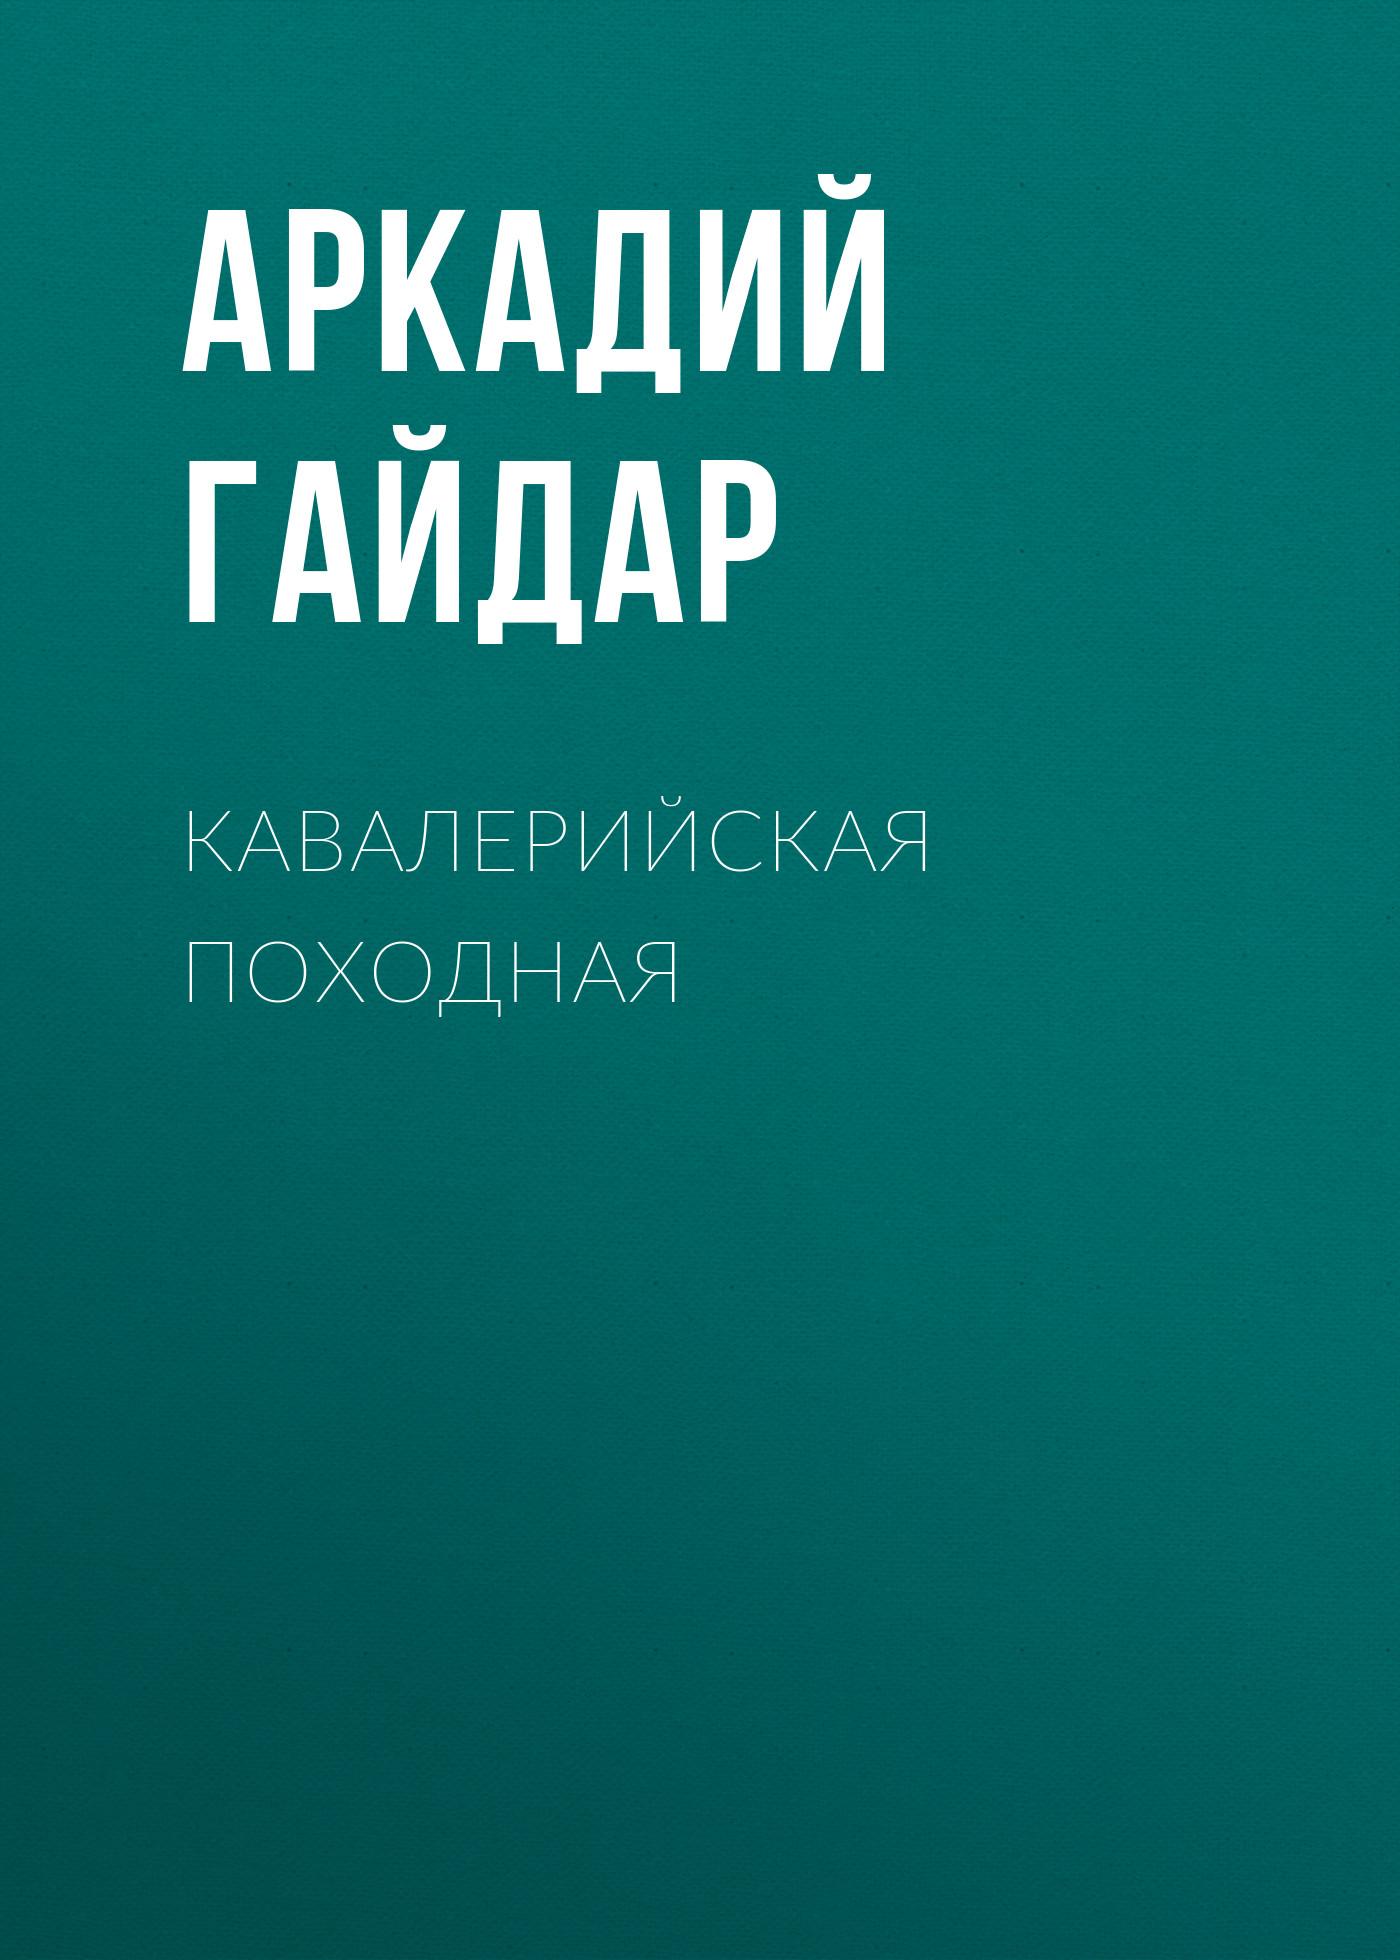 Аркадий Гайдар Кавалерийская походная аркадий гайдар избранное